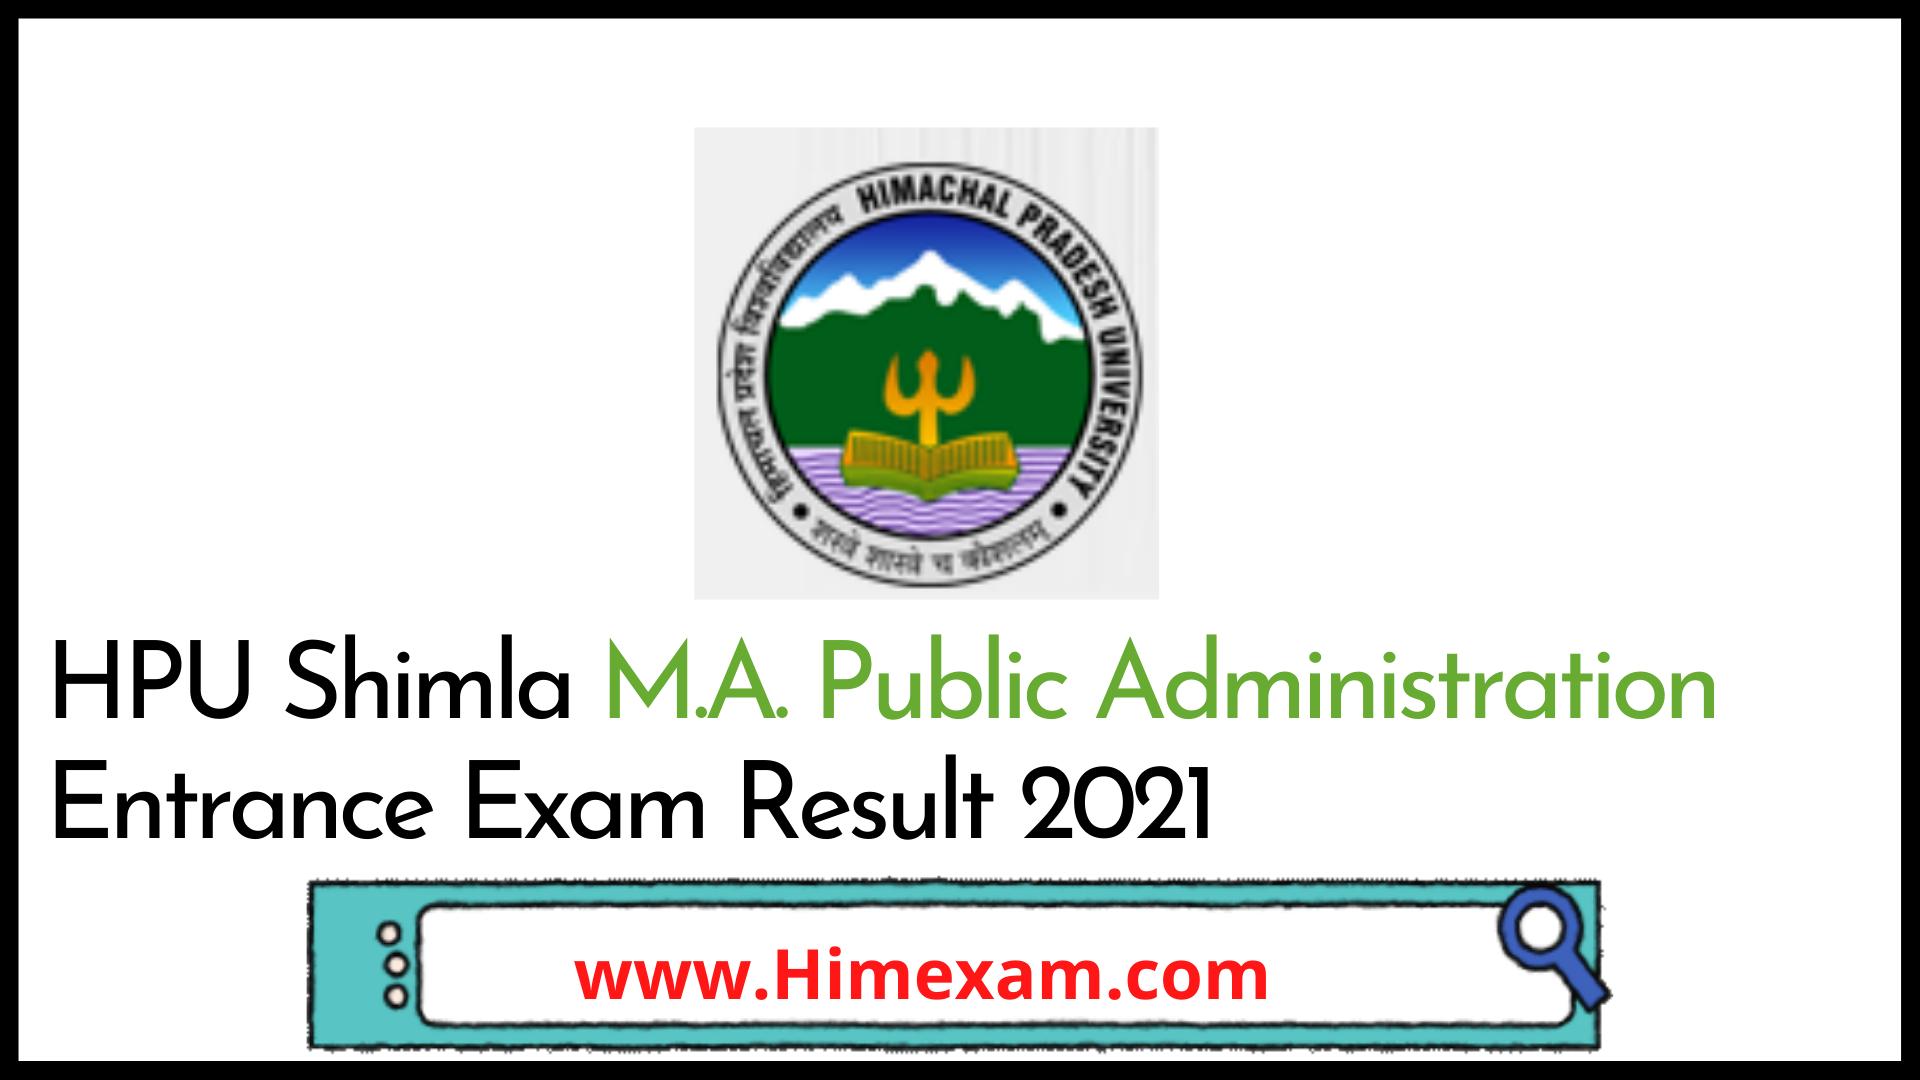 HPU Shimla M.A. Public Administration Entrance Exam Result 2021